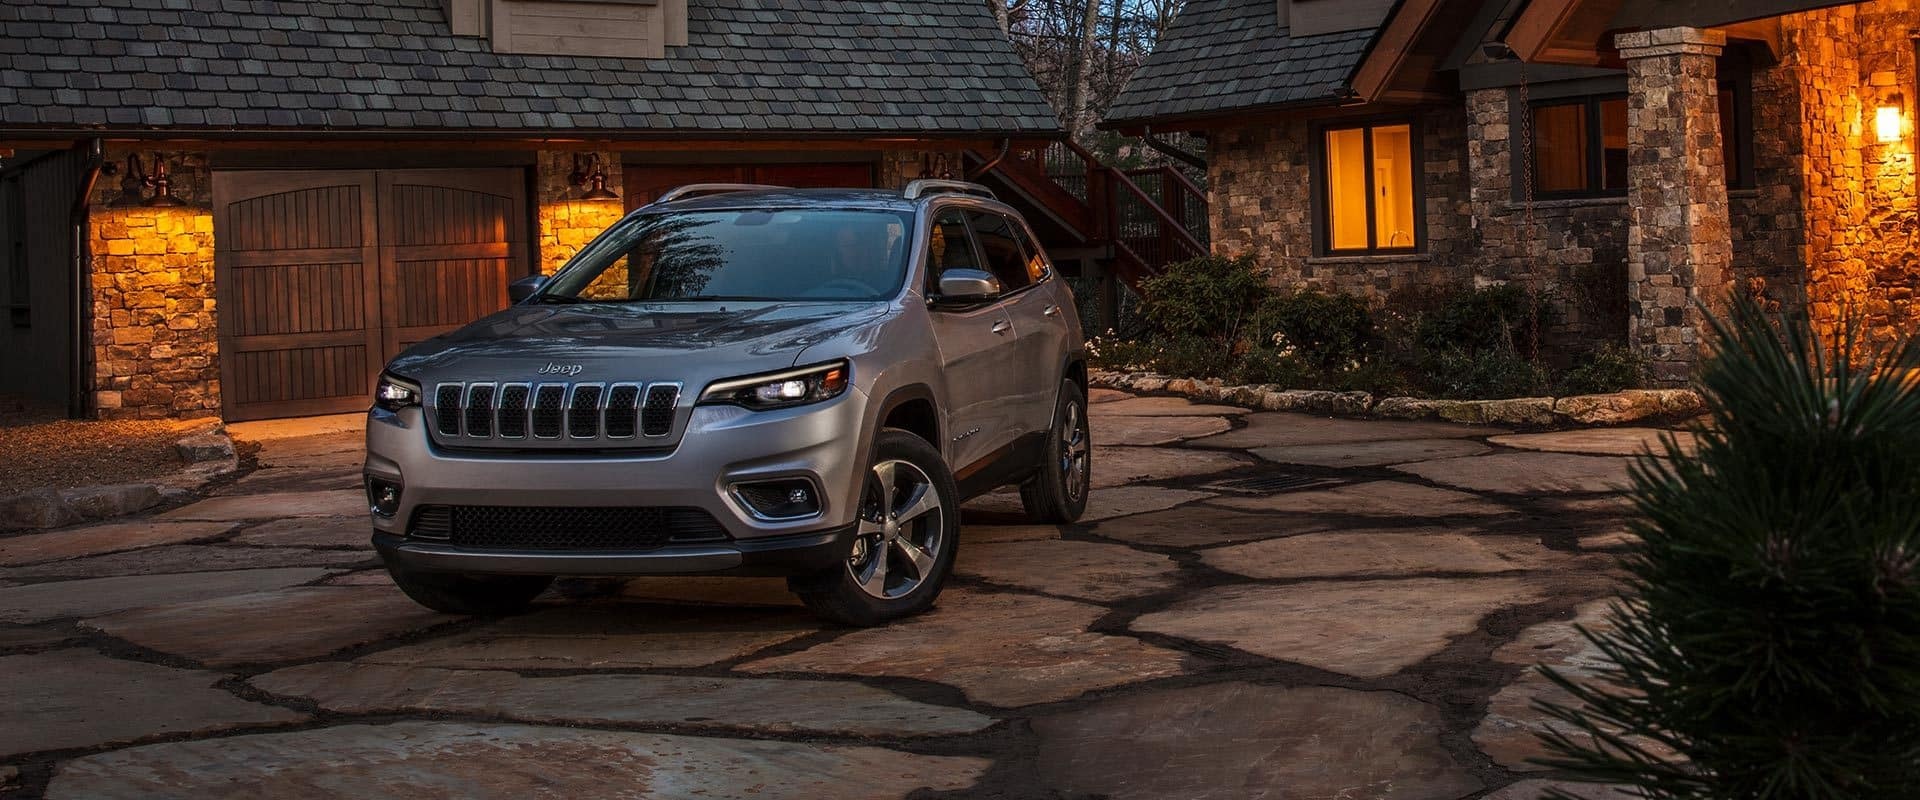 Jeep Cherokee Led Lights